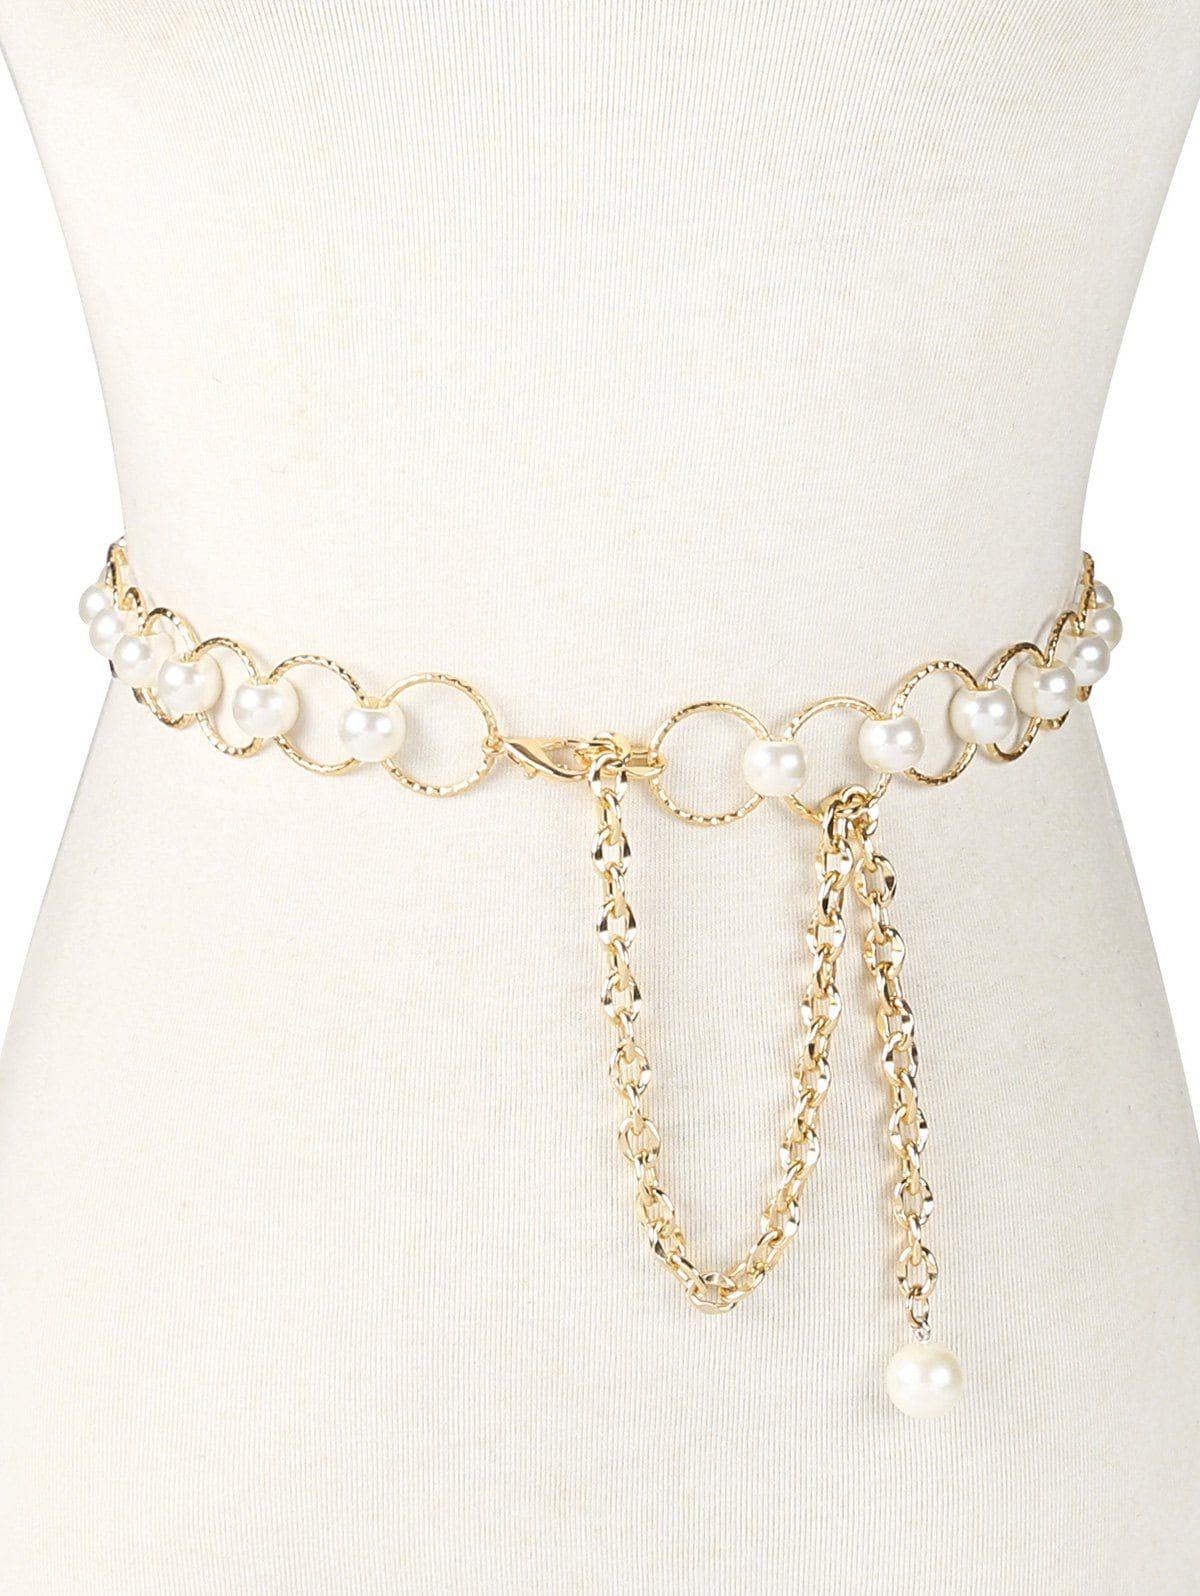 Fashion Metal Waist Chain Gilding Belt Decoration for Dresses Girls Belts Chain